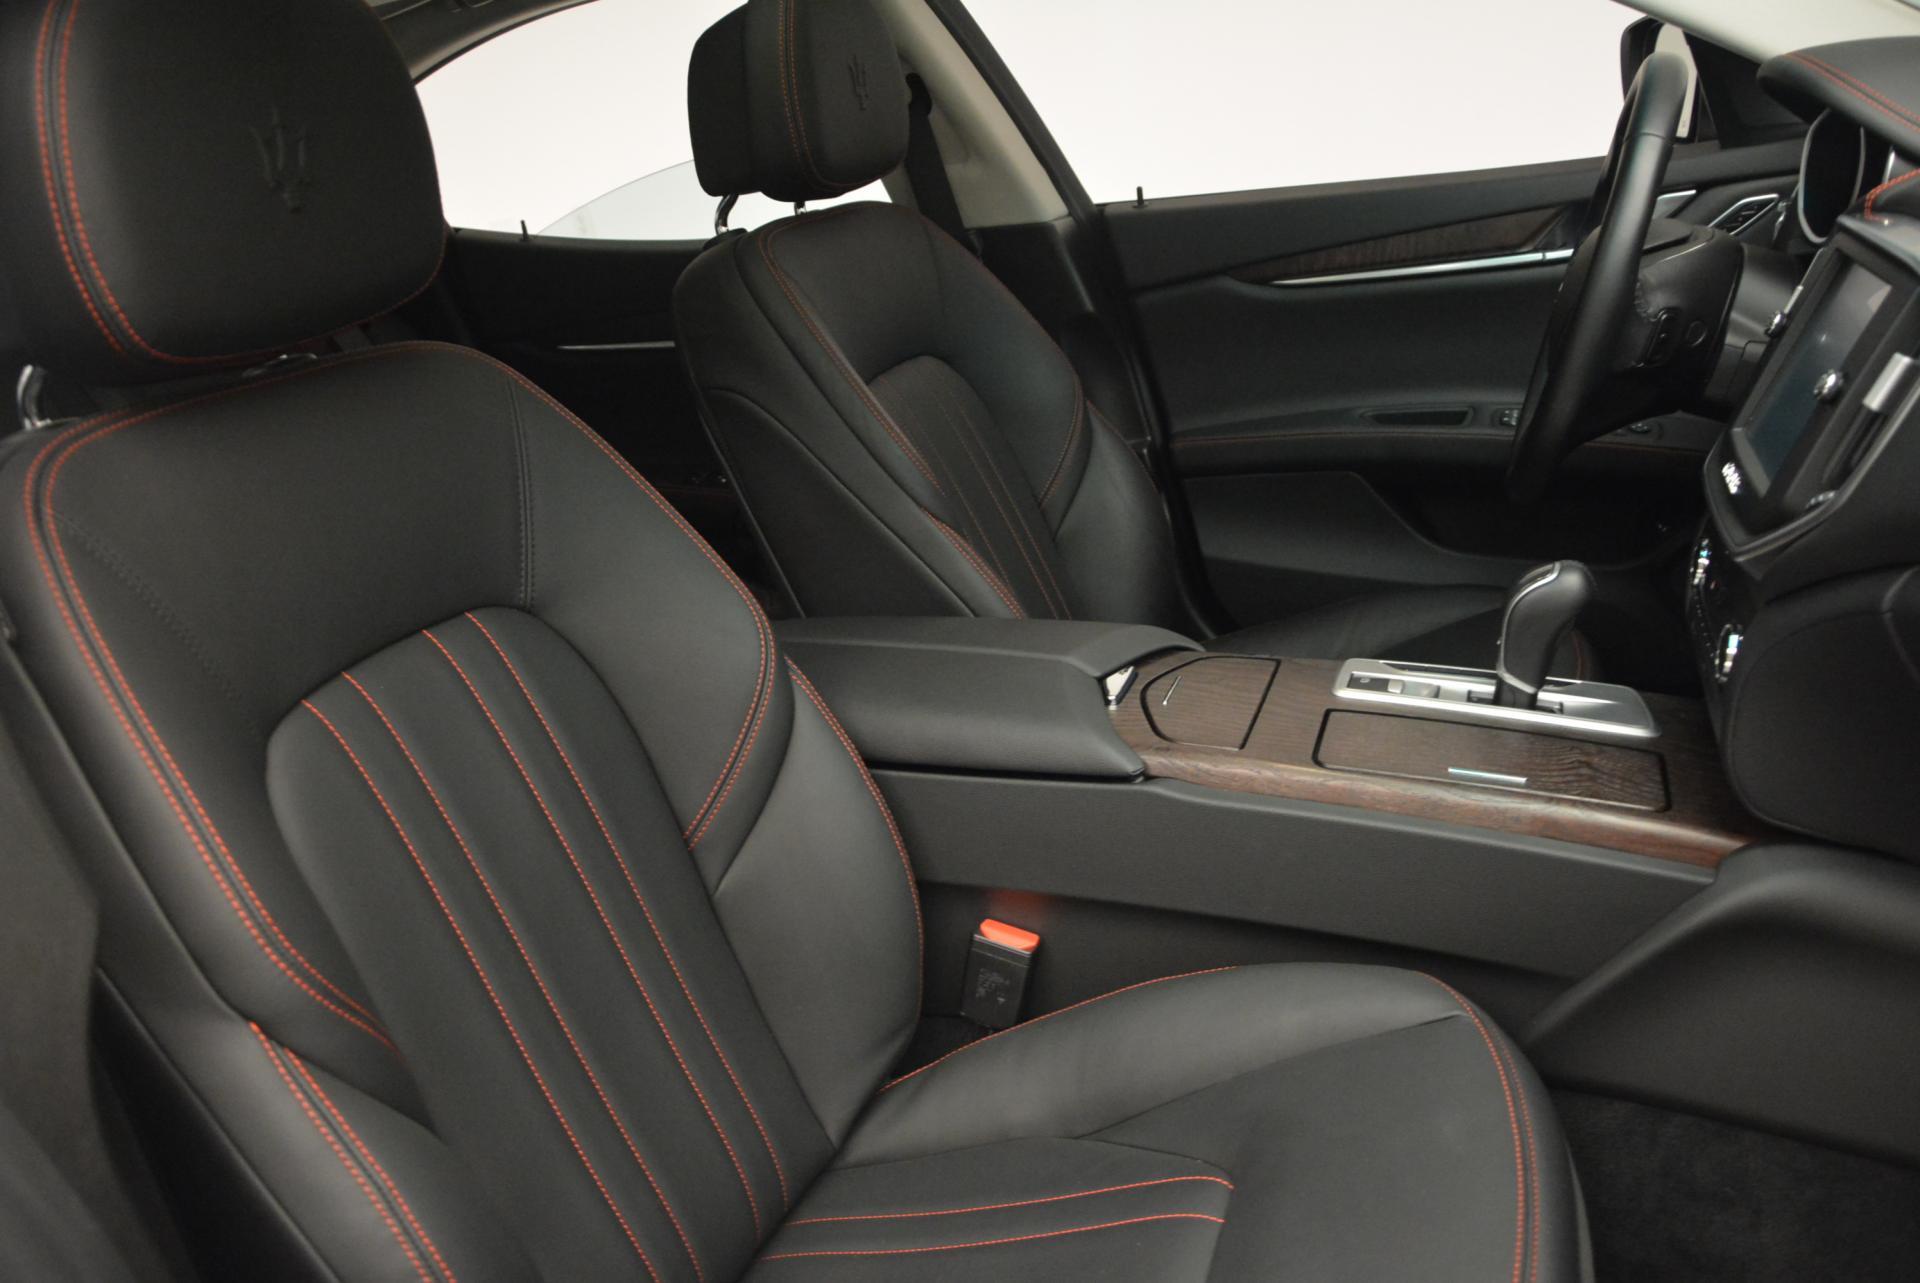 Used 2016 Maserati Ghibli S Q4 For Sale In Greenwich, CT. Alfa Romeo of Greenwich, M1478 192_p16